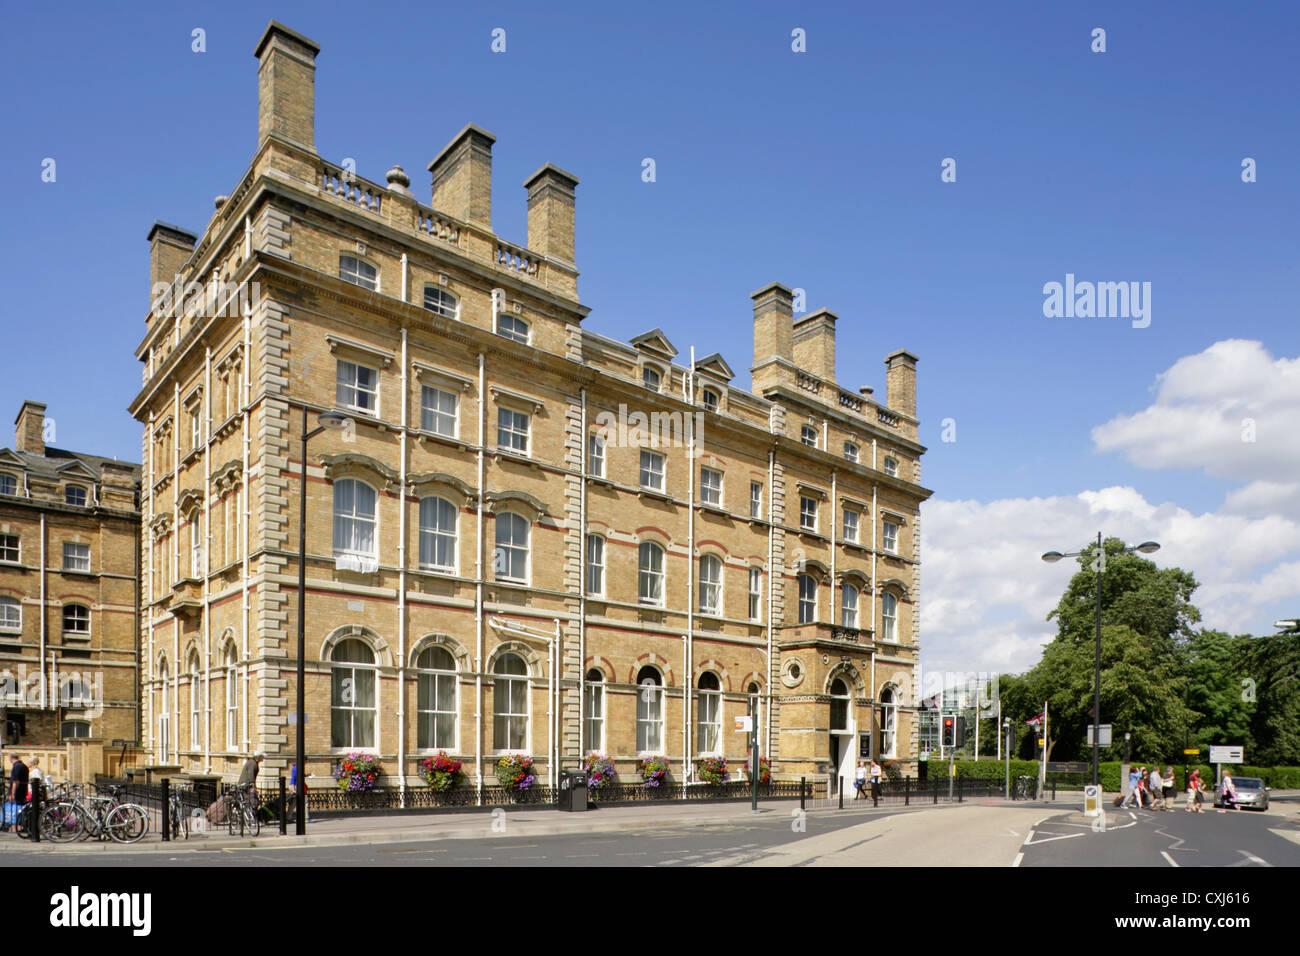 Royal Grand Hotel York